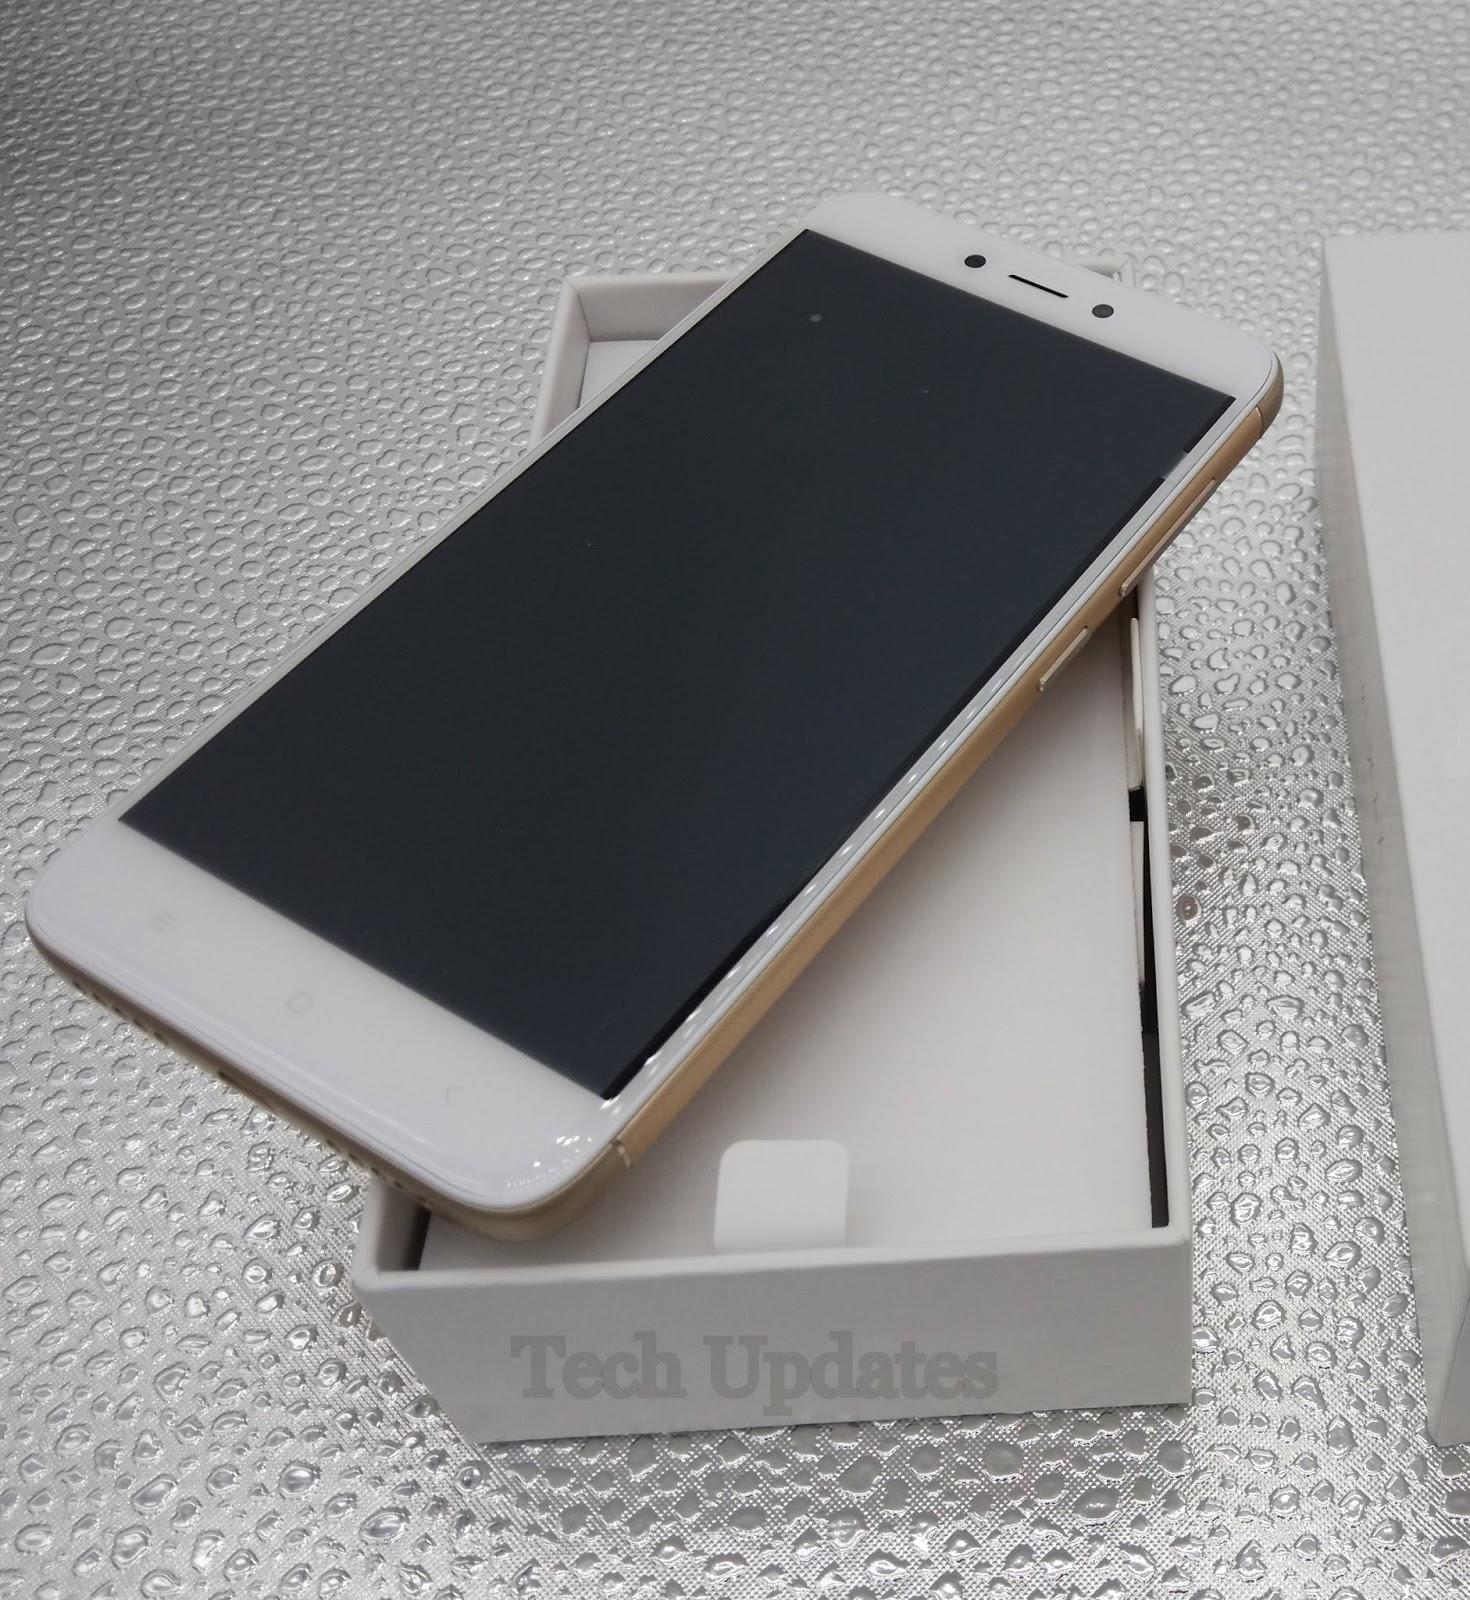 Xiaomi redmi 4x tips and tricks tech updates xiaomi redmi 4x tips and tricks stopboris Gallery